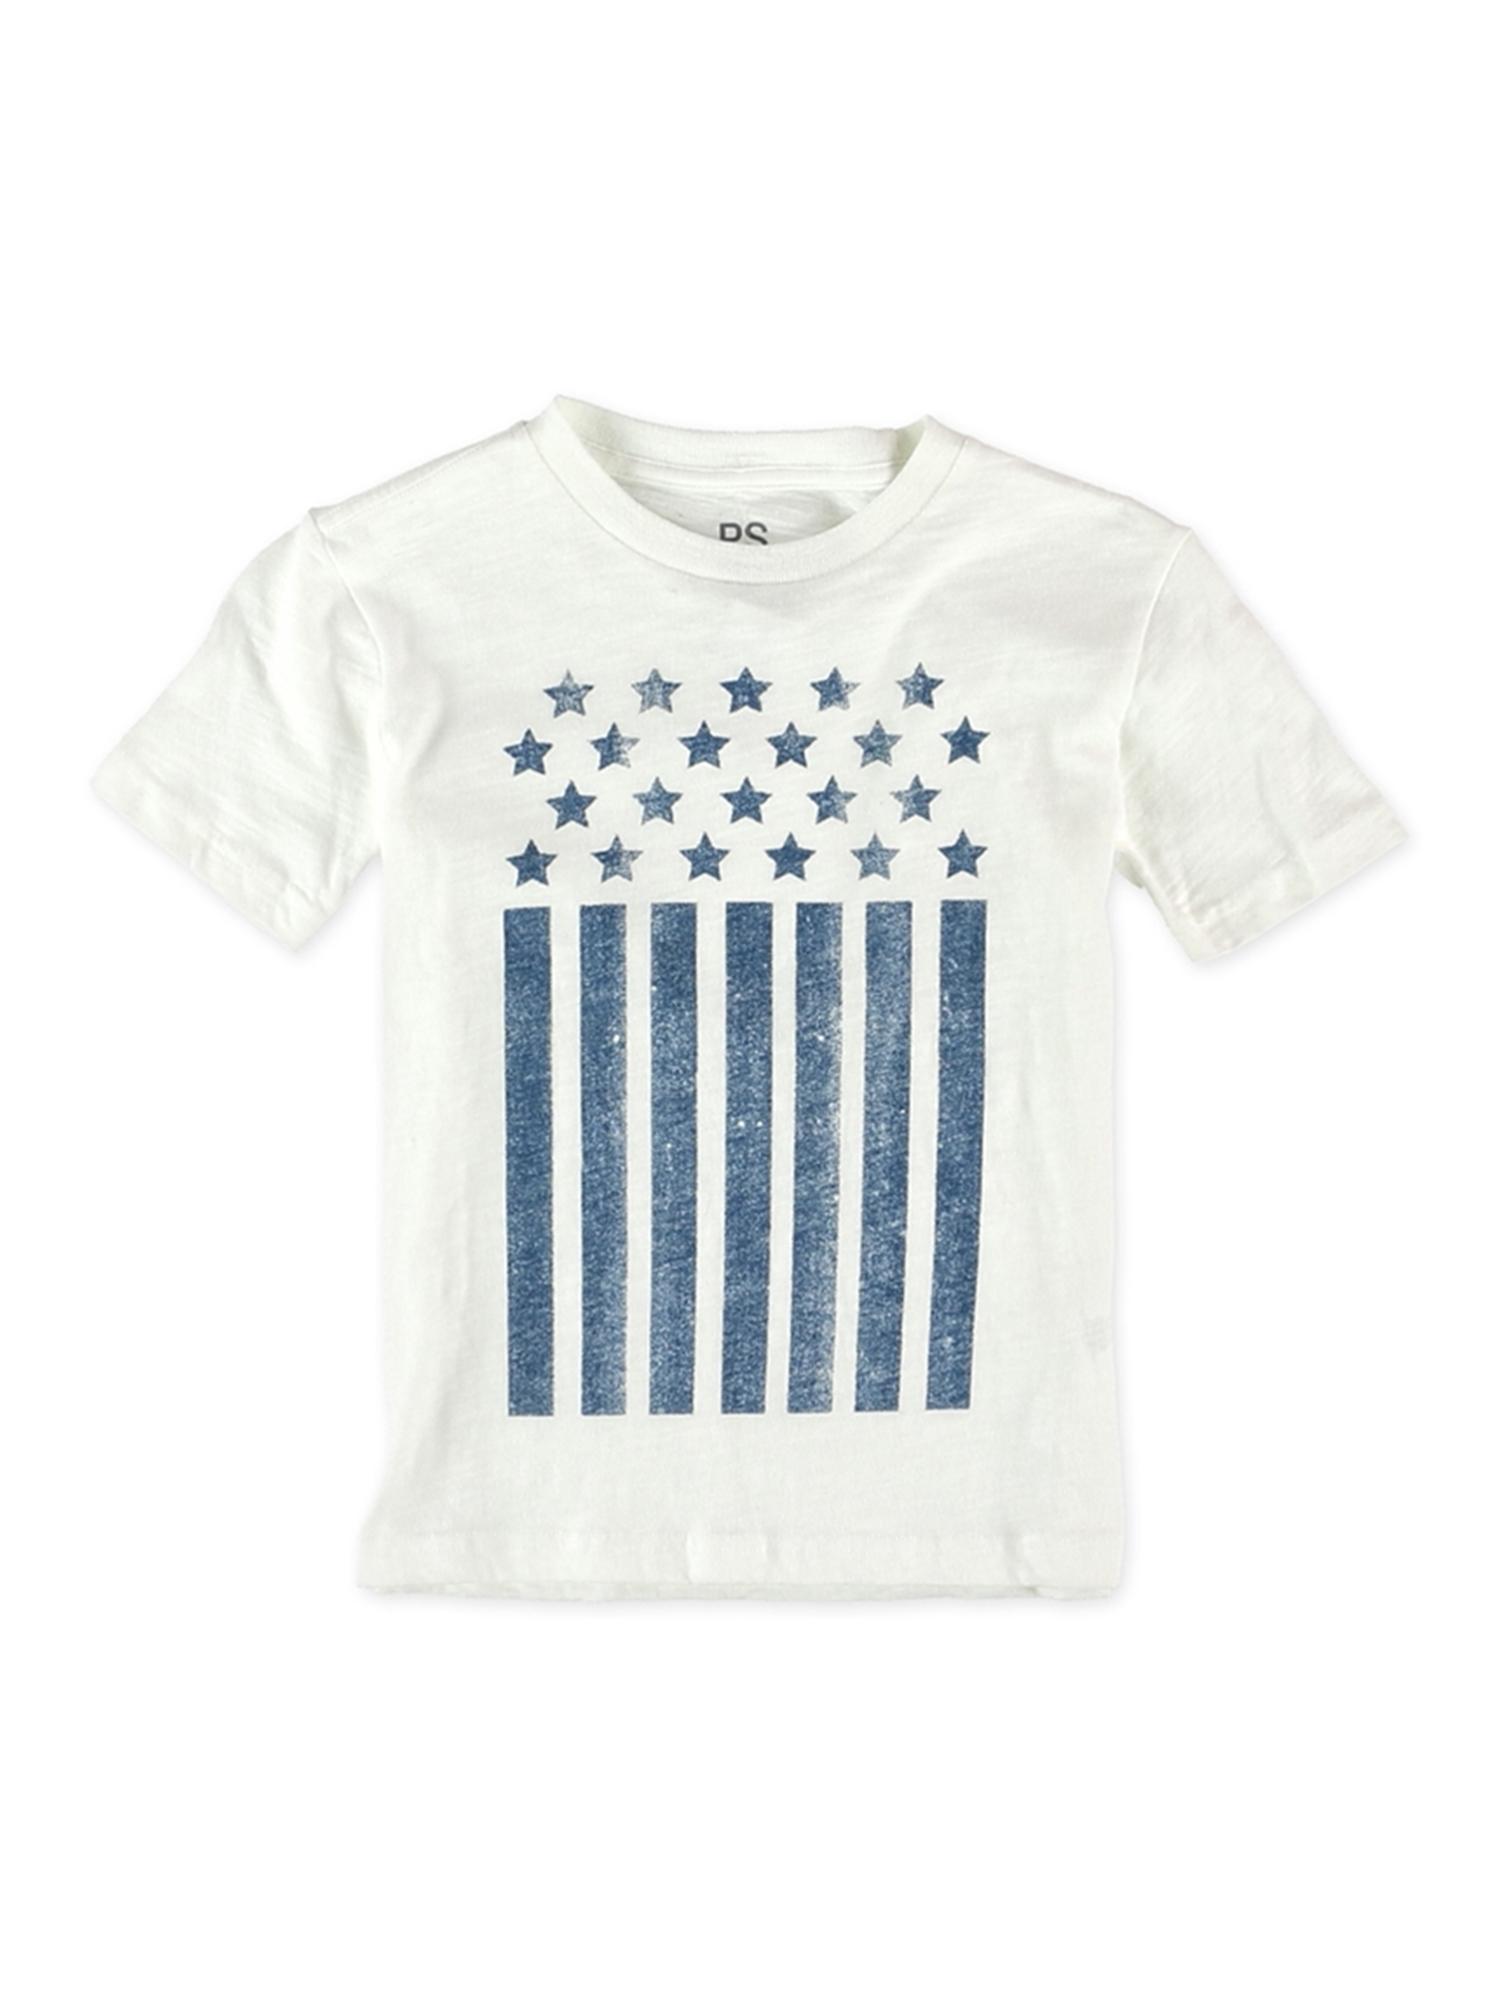 Aeropostale Boys Stars & Stripes Graphic T-Shirt